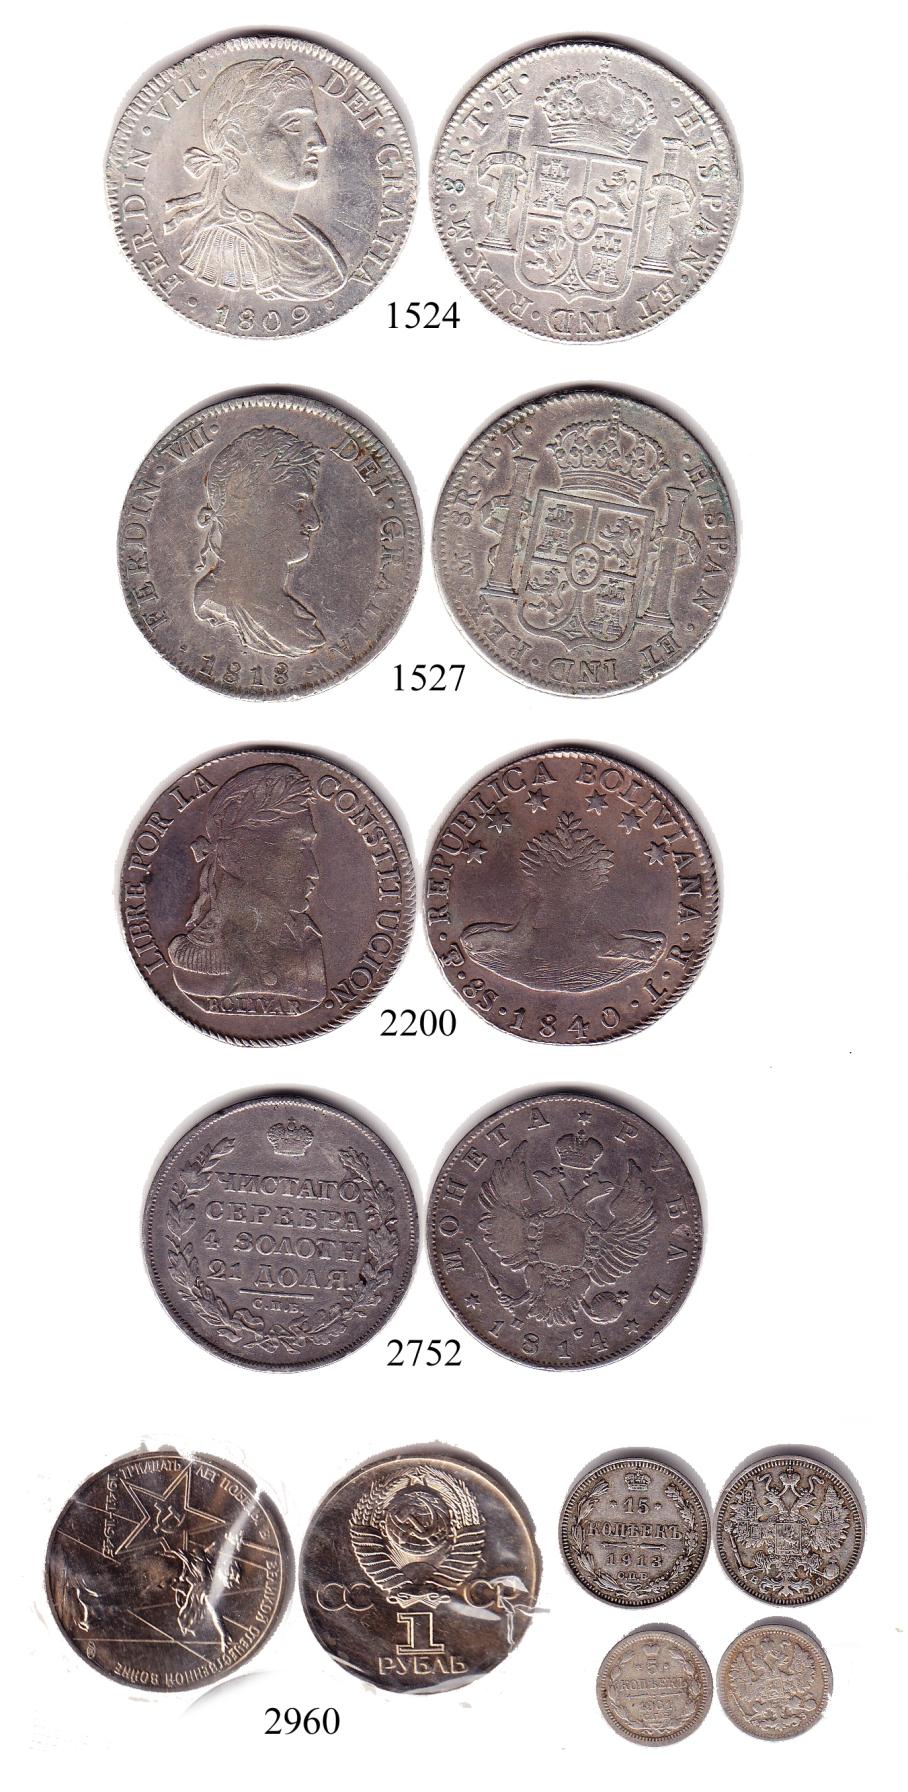 1524-1527-2200-2752-2960